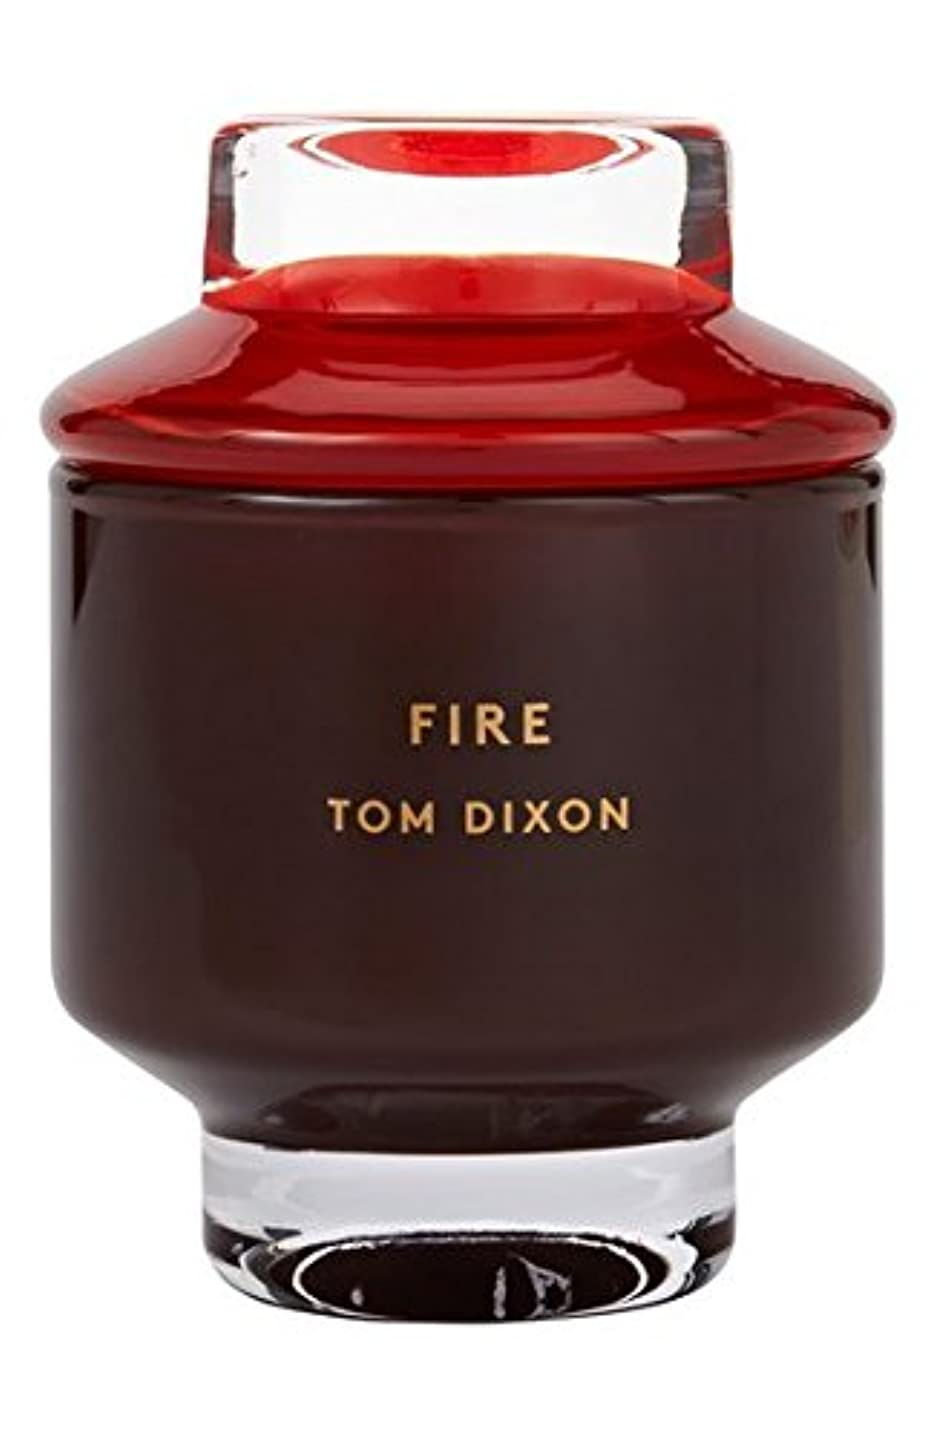 Tom Dixon 'Fire' Candle (トム ディクソン 'ファイヤー' キャンドル大) Large